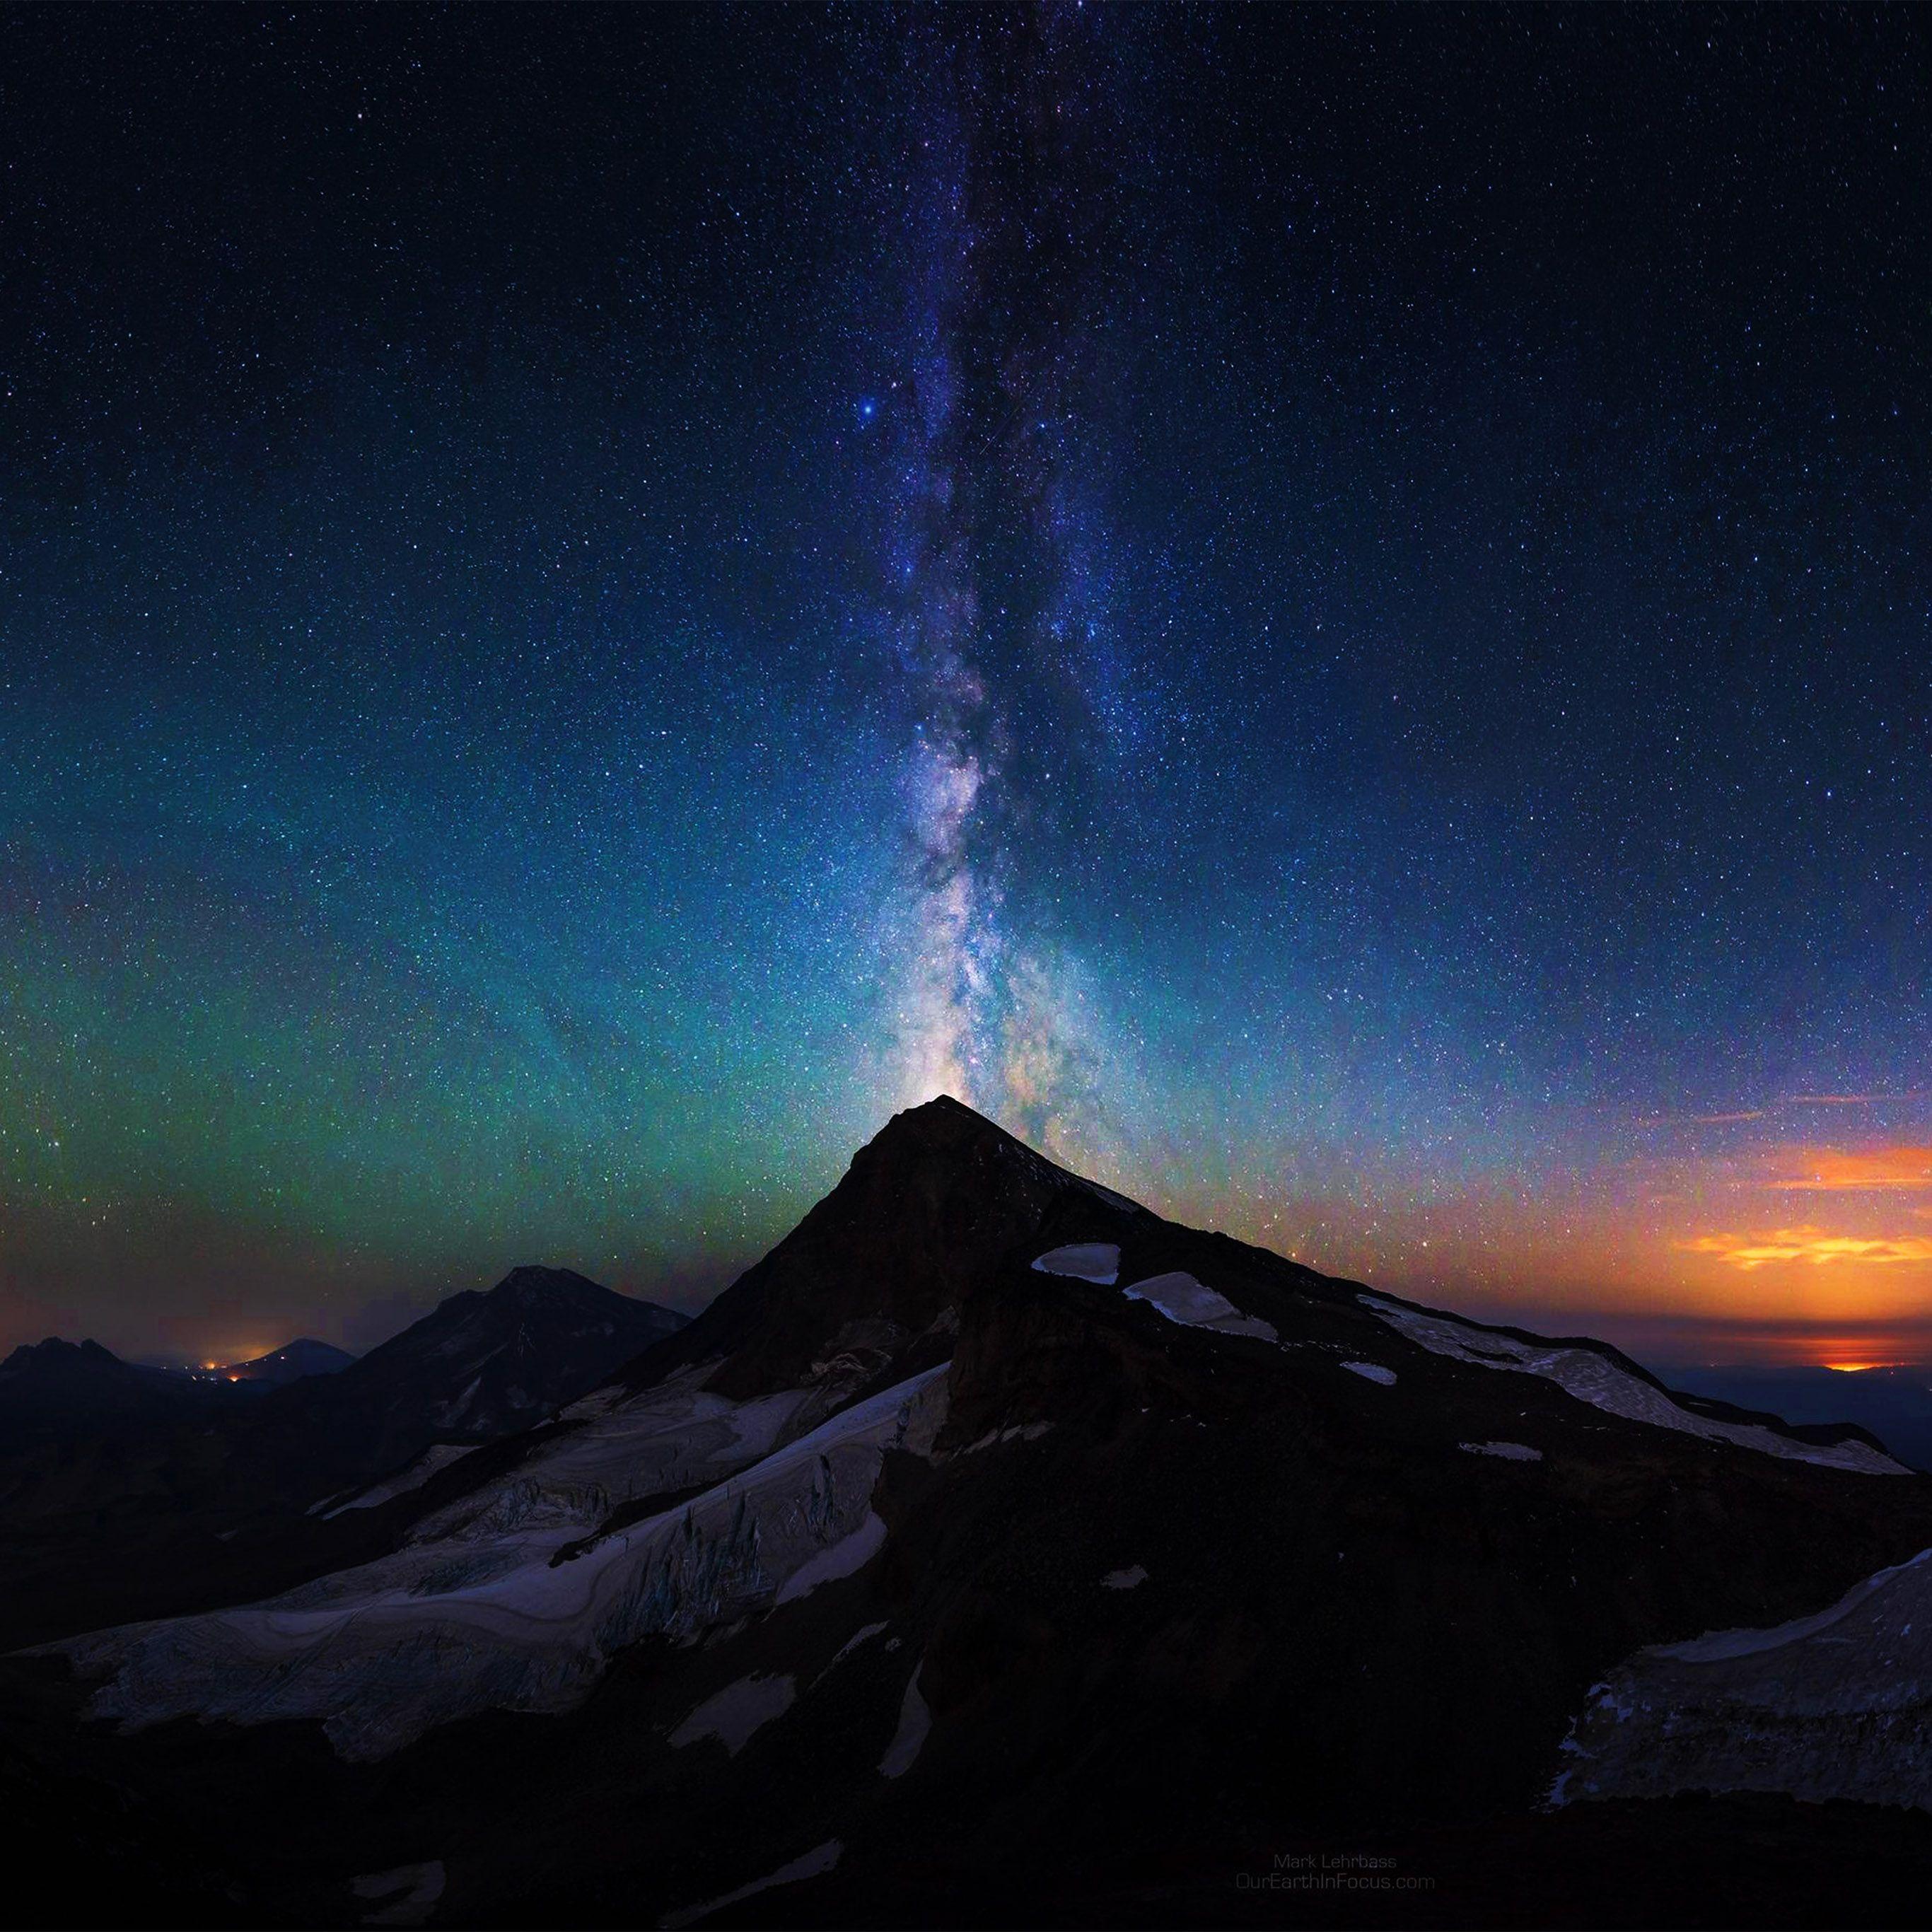 Mountain Aurora Sky Night Star Milky Way Ipad Pro Wallpapers Milky Way Wallpaper Aurora Sky Milky Way Wallpaper Iphone